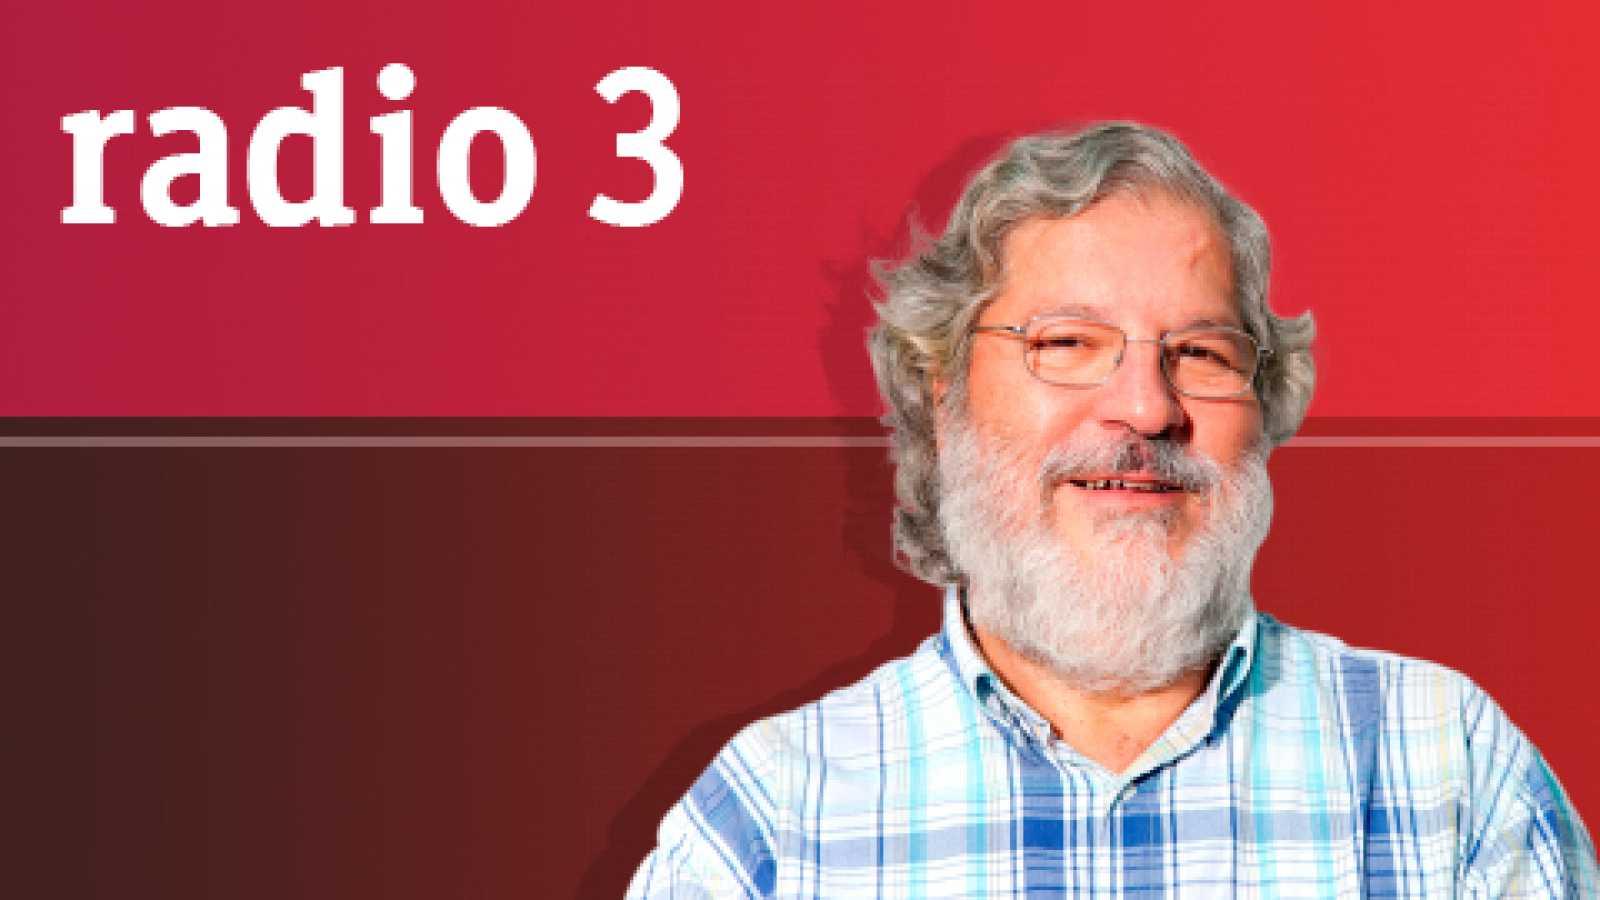 Discópolis 11.192 - Alan Stivell Live Madrid 1979. Tercera parte - 11/01/21 - escuchar ahora